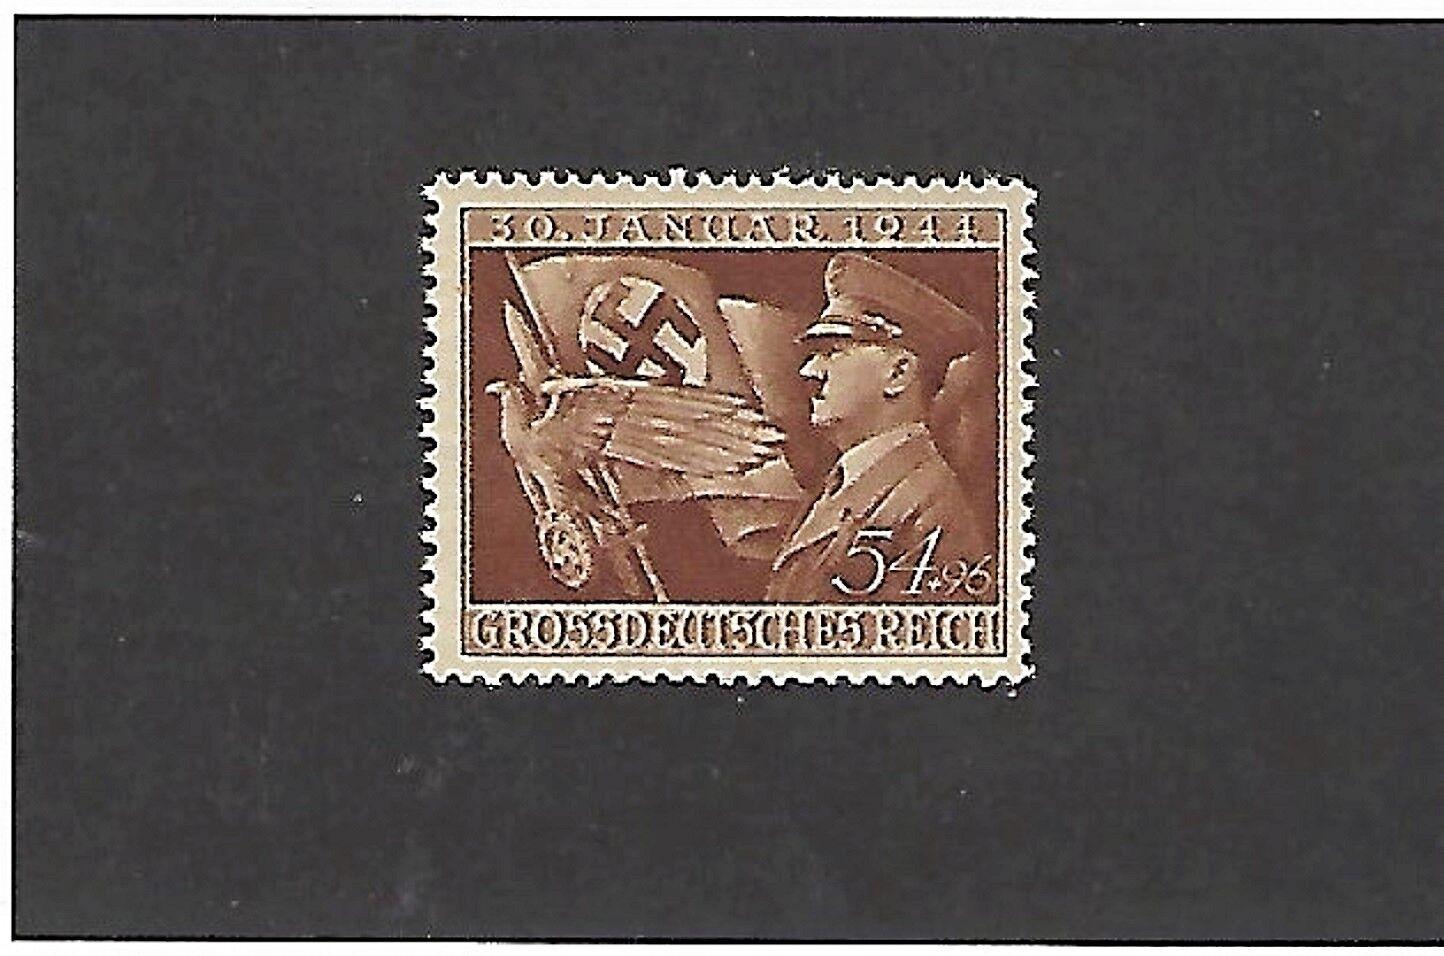 MNH 1944 stamp  / 10th Anniversary Hitler & Nazi's assume power / Third Reich